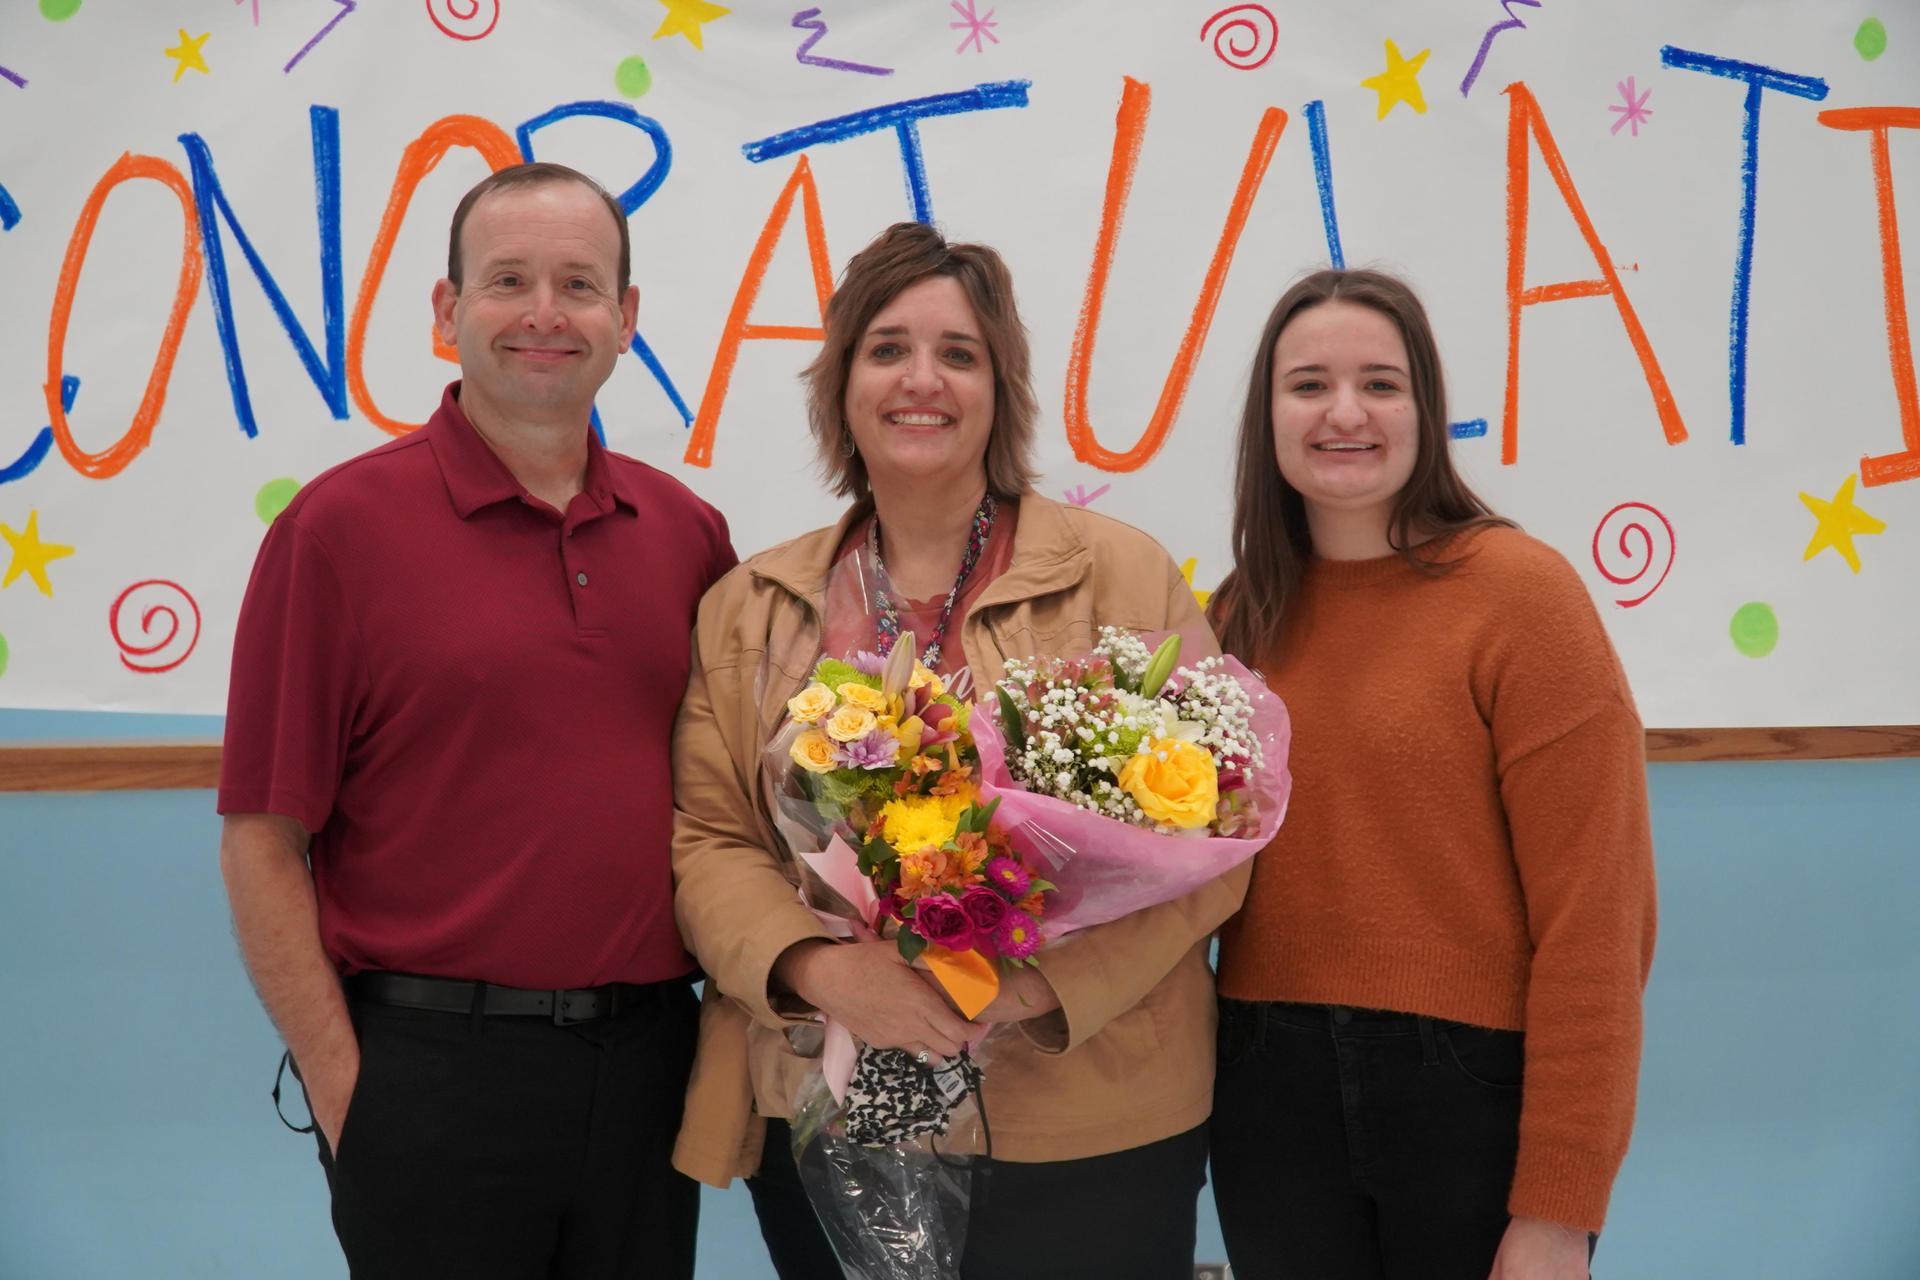 Susan Skrabanek and her family